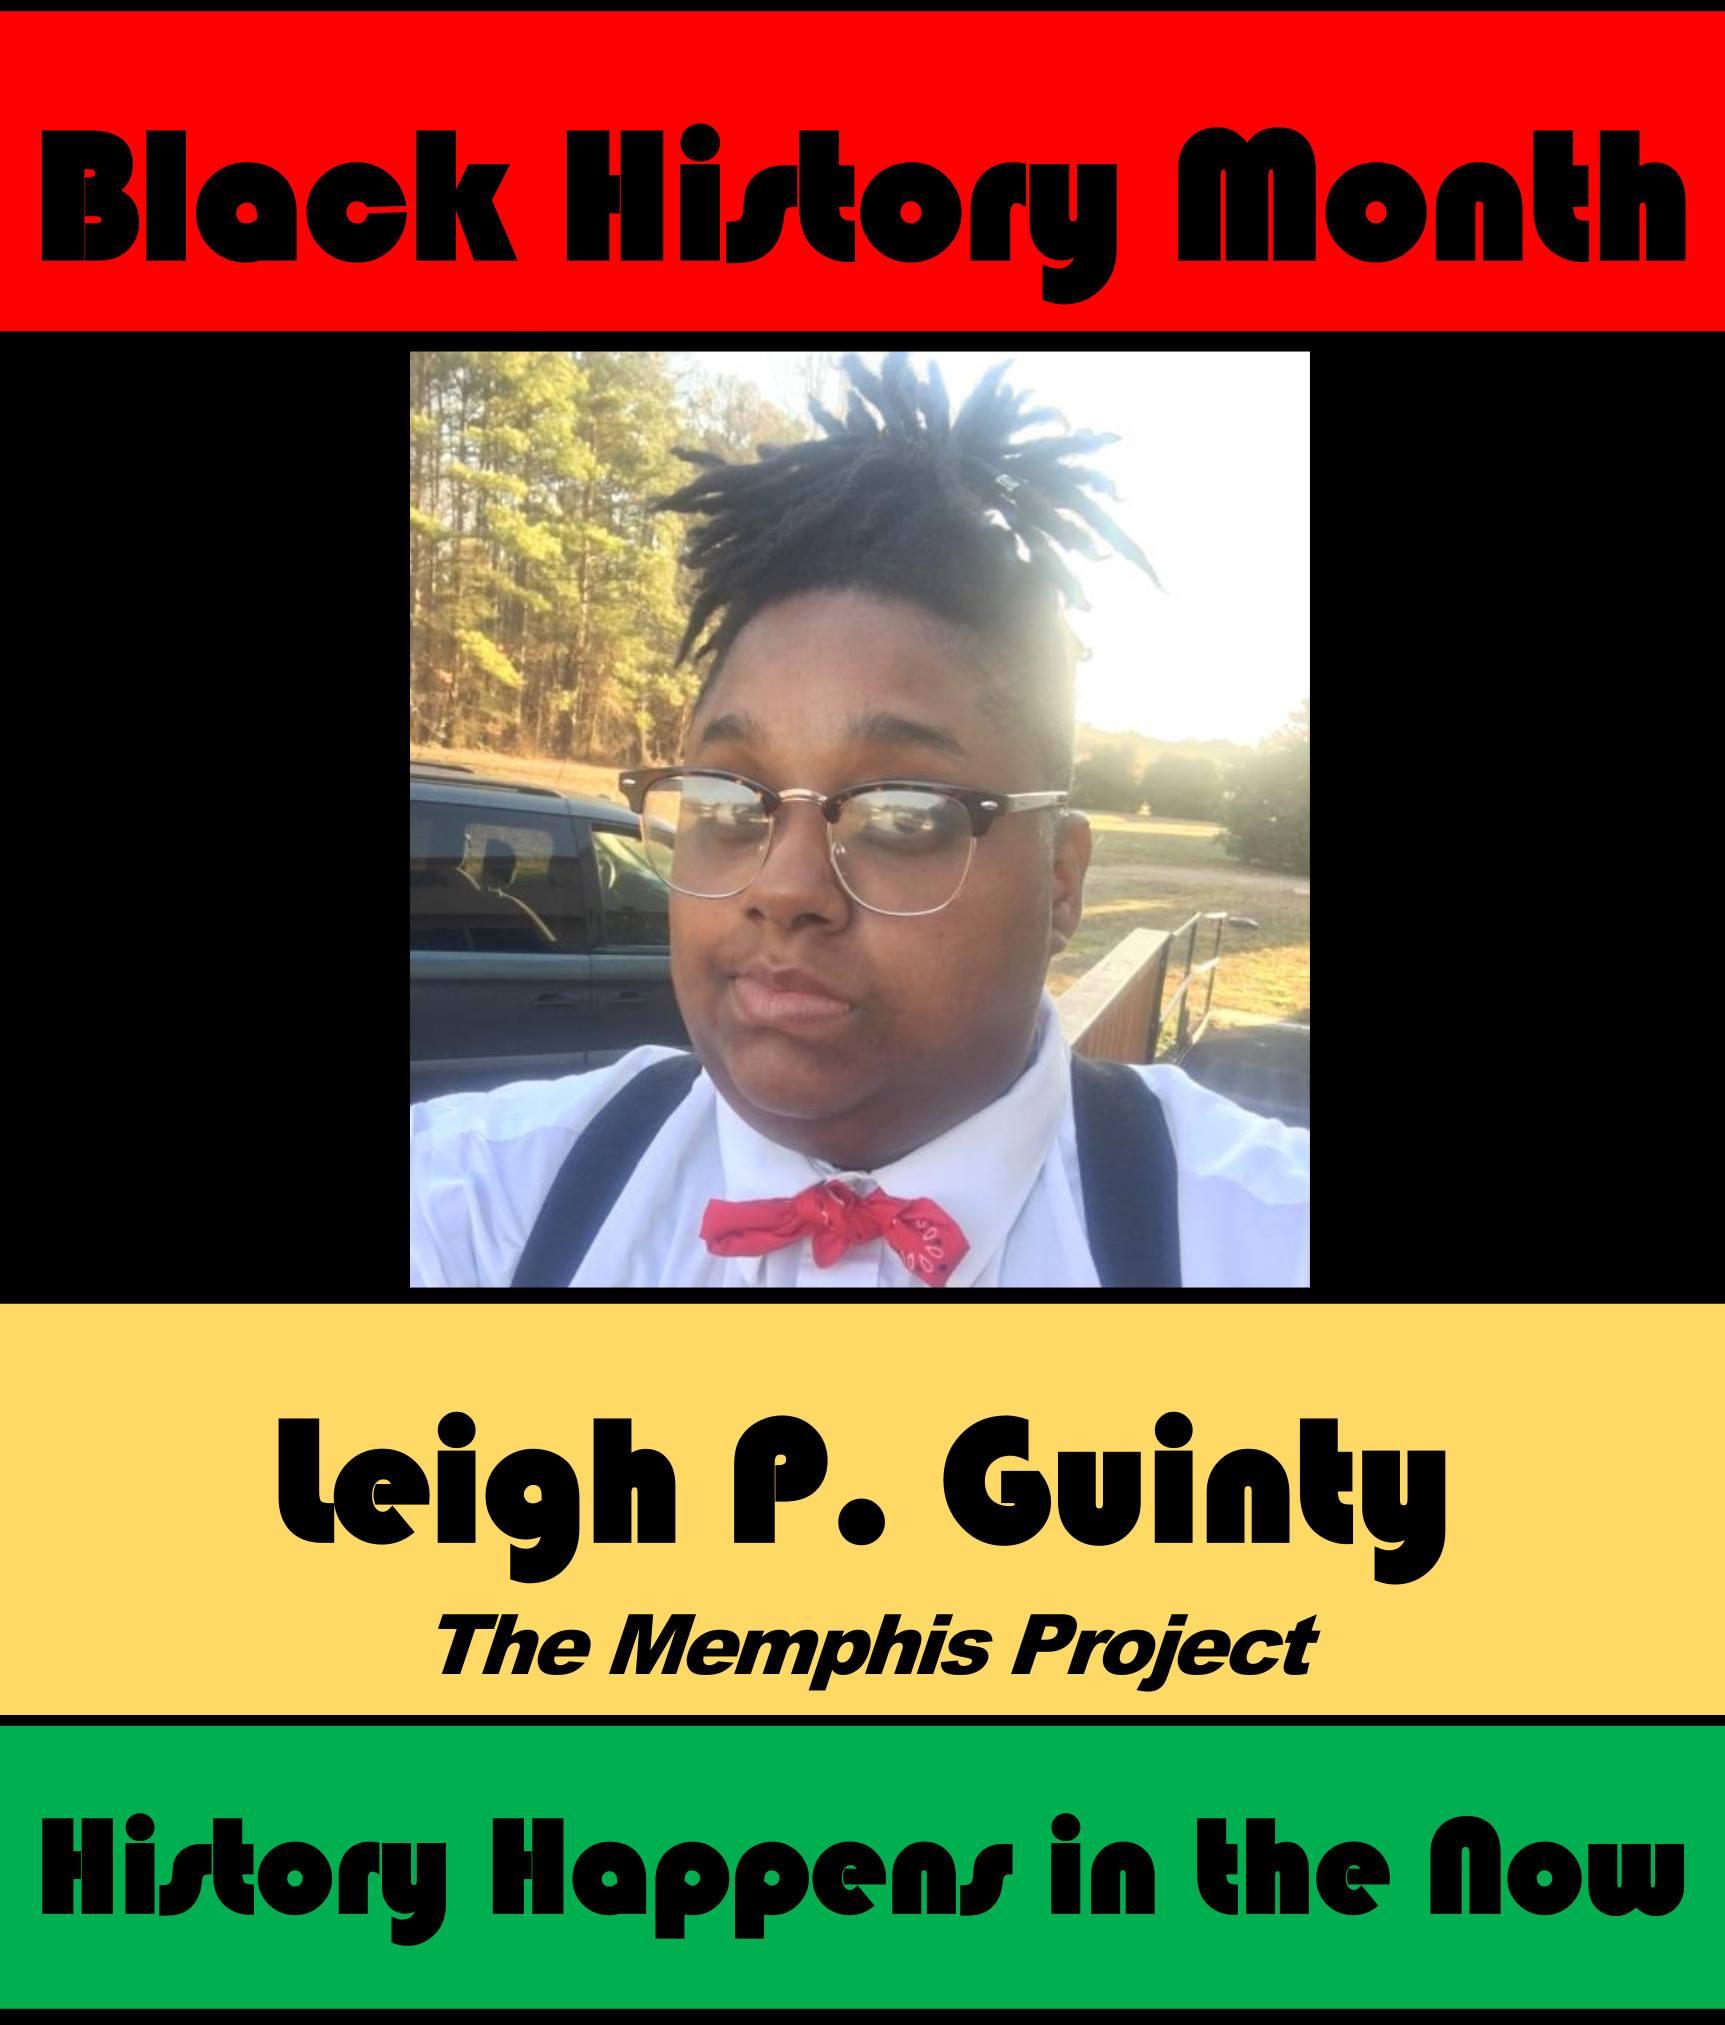 Leigh P. Guinty #POCKLEBlackHistoryMonth